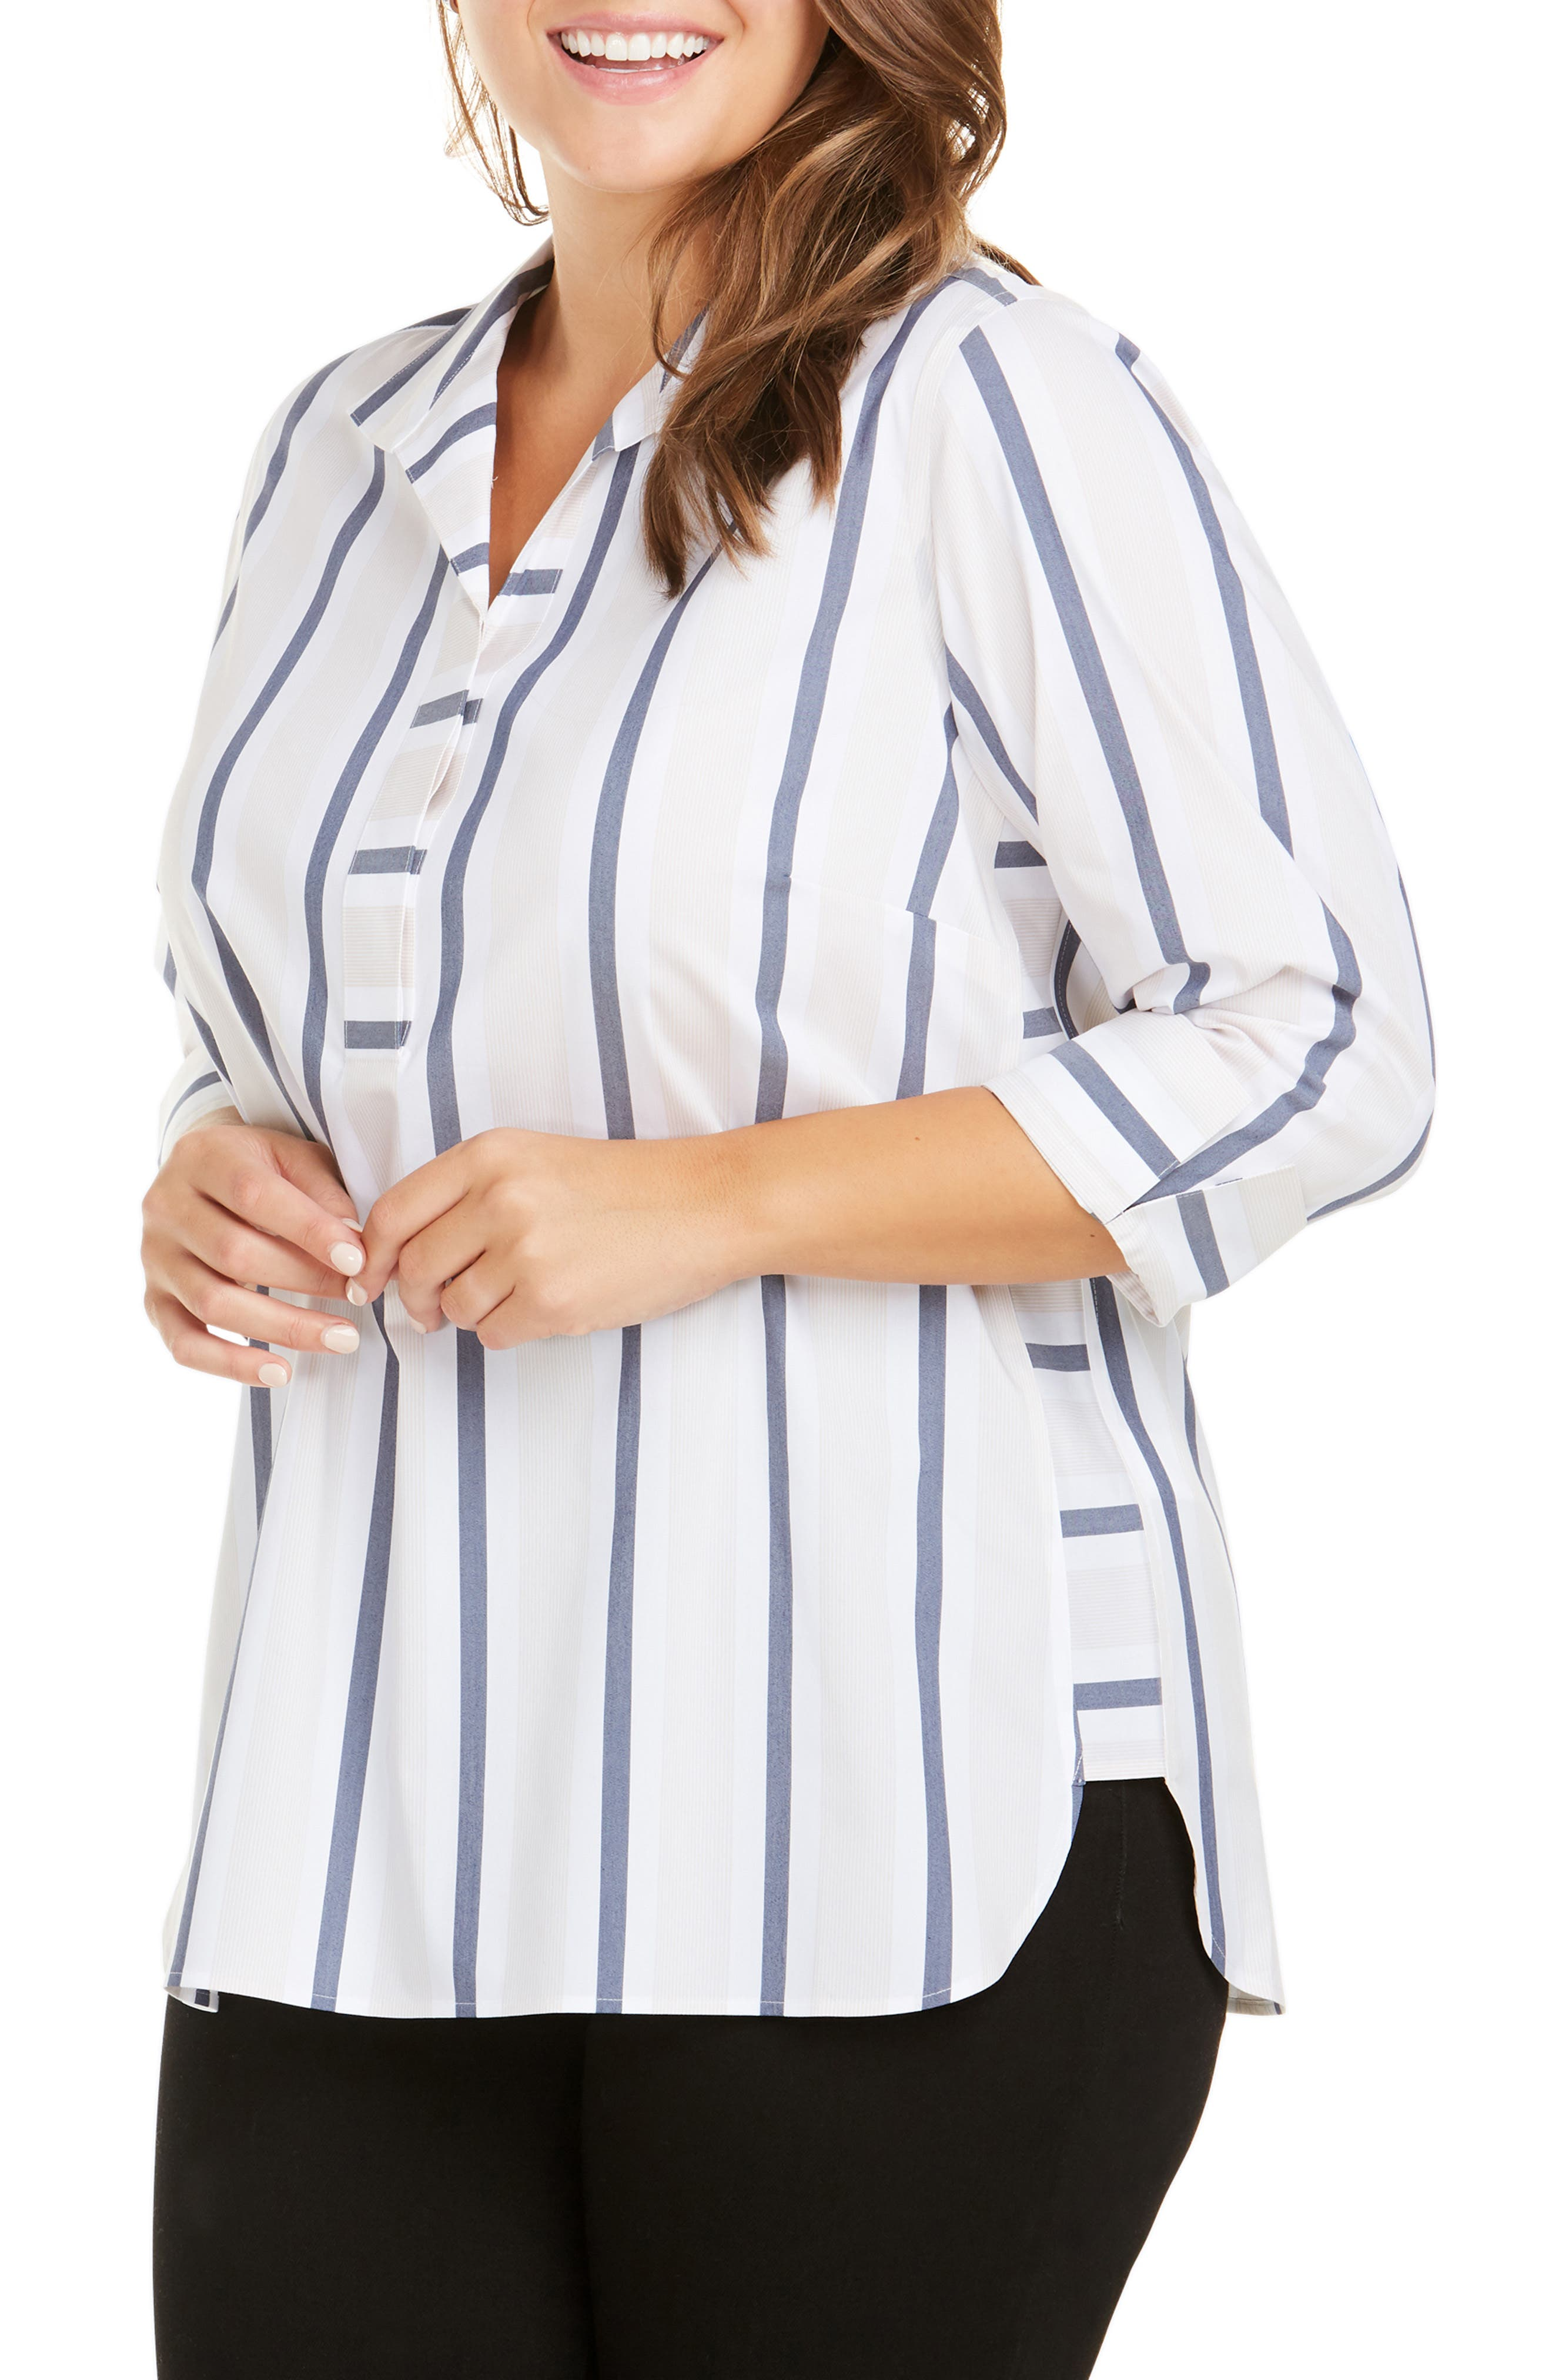 FOXCROFT, Dora Variegated Stripe Shirt, Main thumbnail 1, color, 400